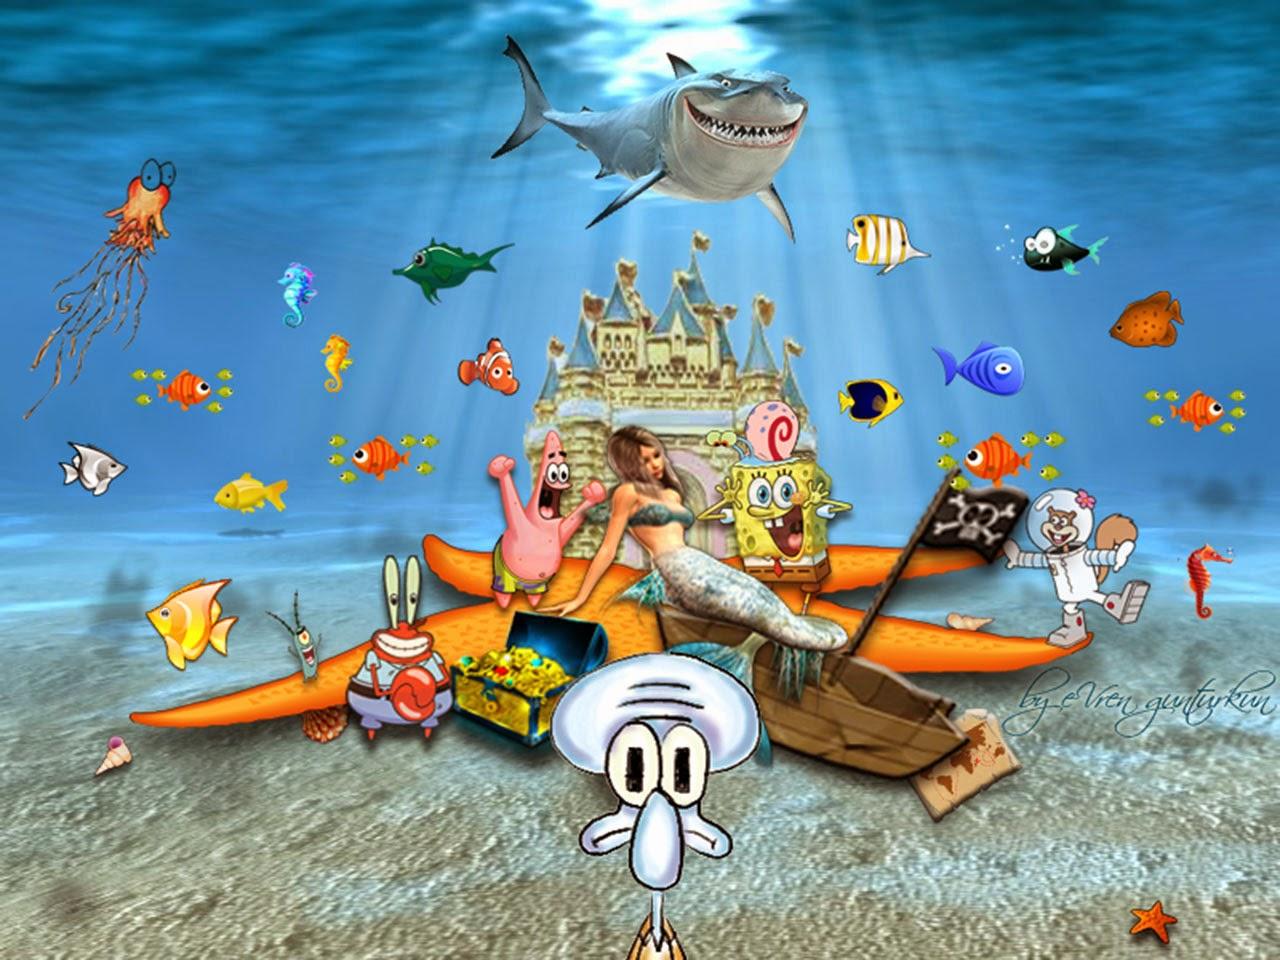 Spongebob Squarepants And Friends 3d Wallpaper Spongebob Friend